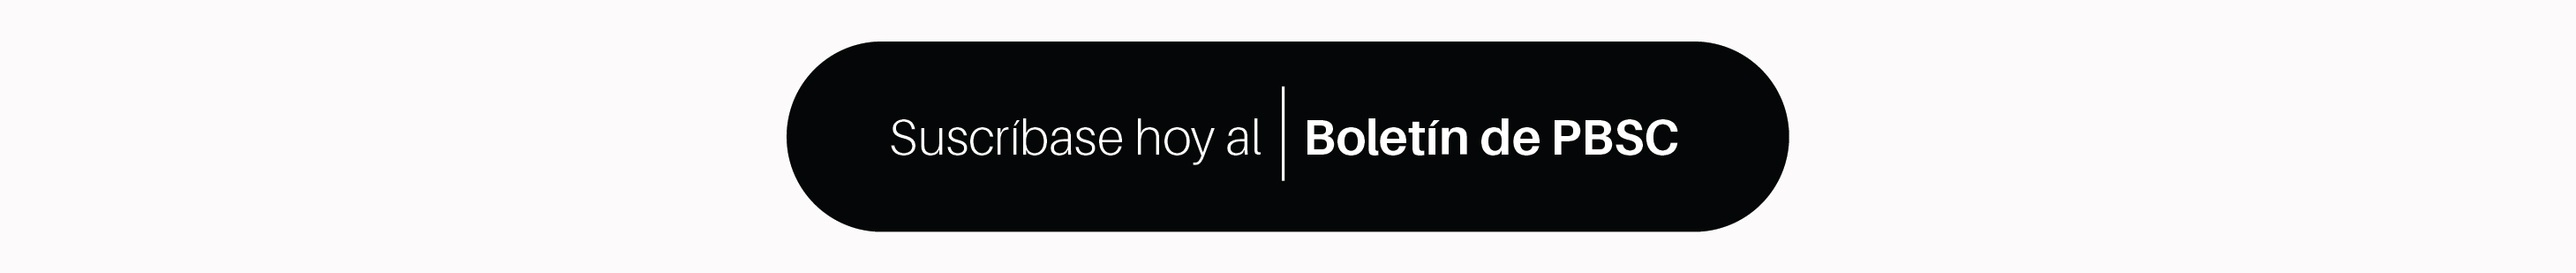 Bouton_final_ES-01.jpg (64 KB)